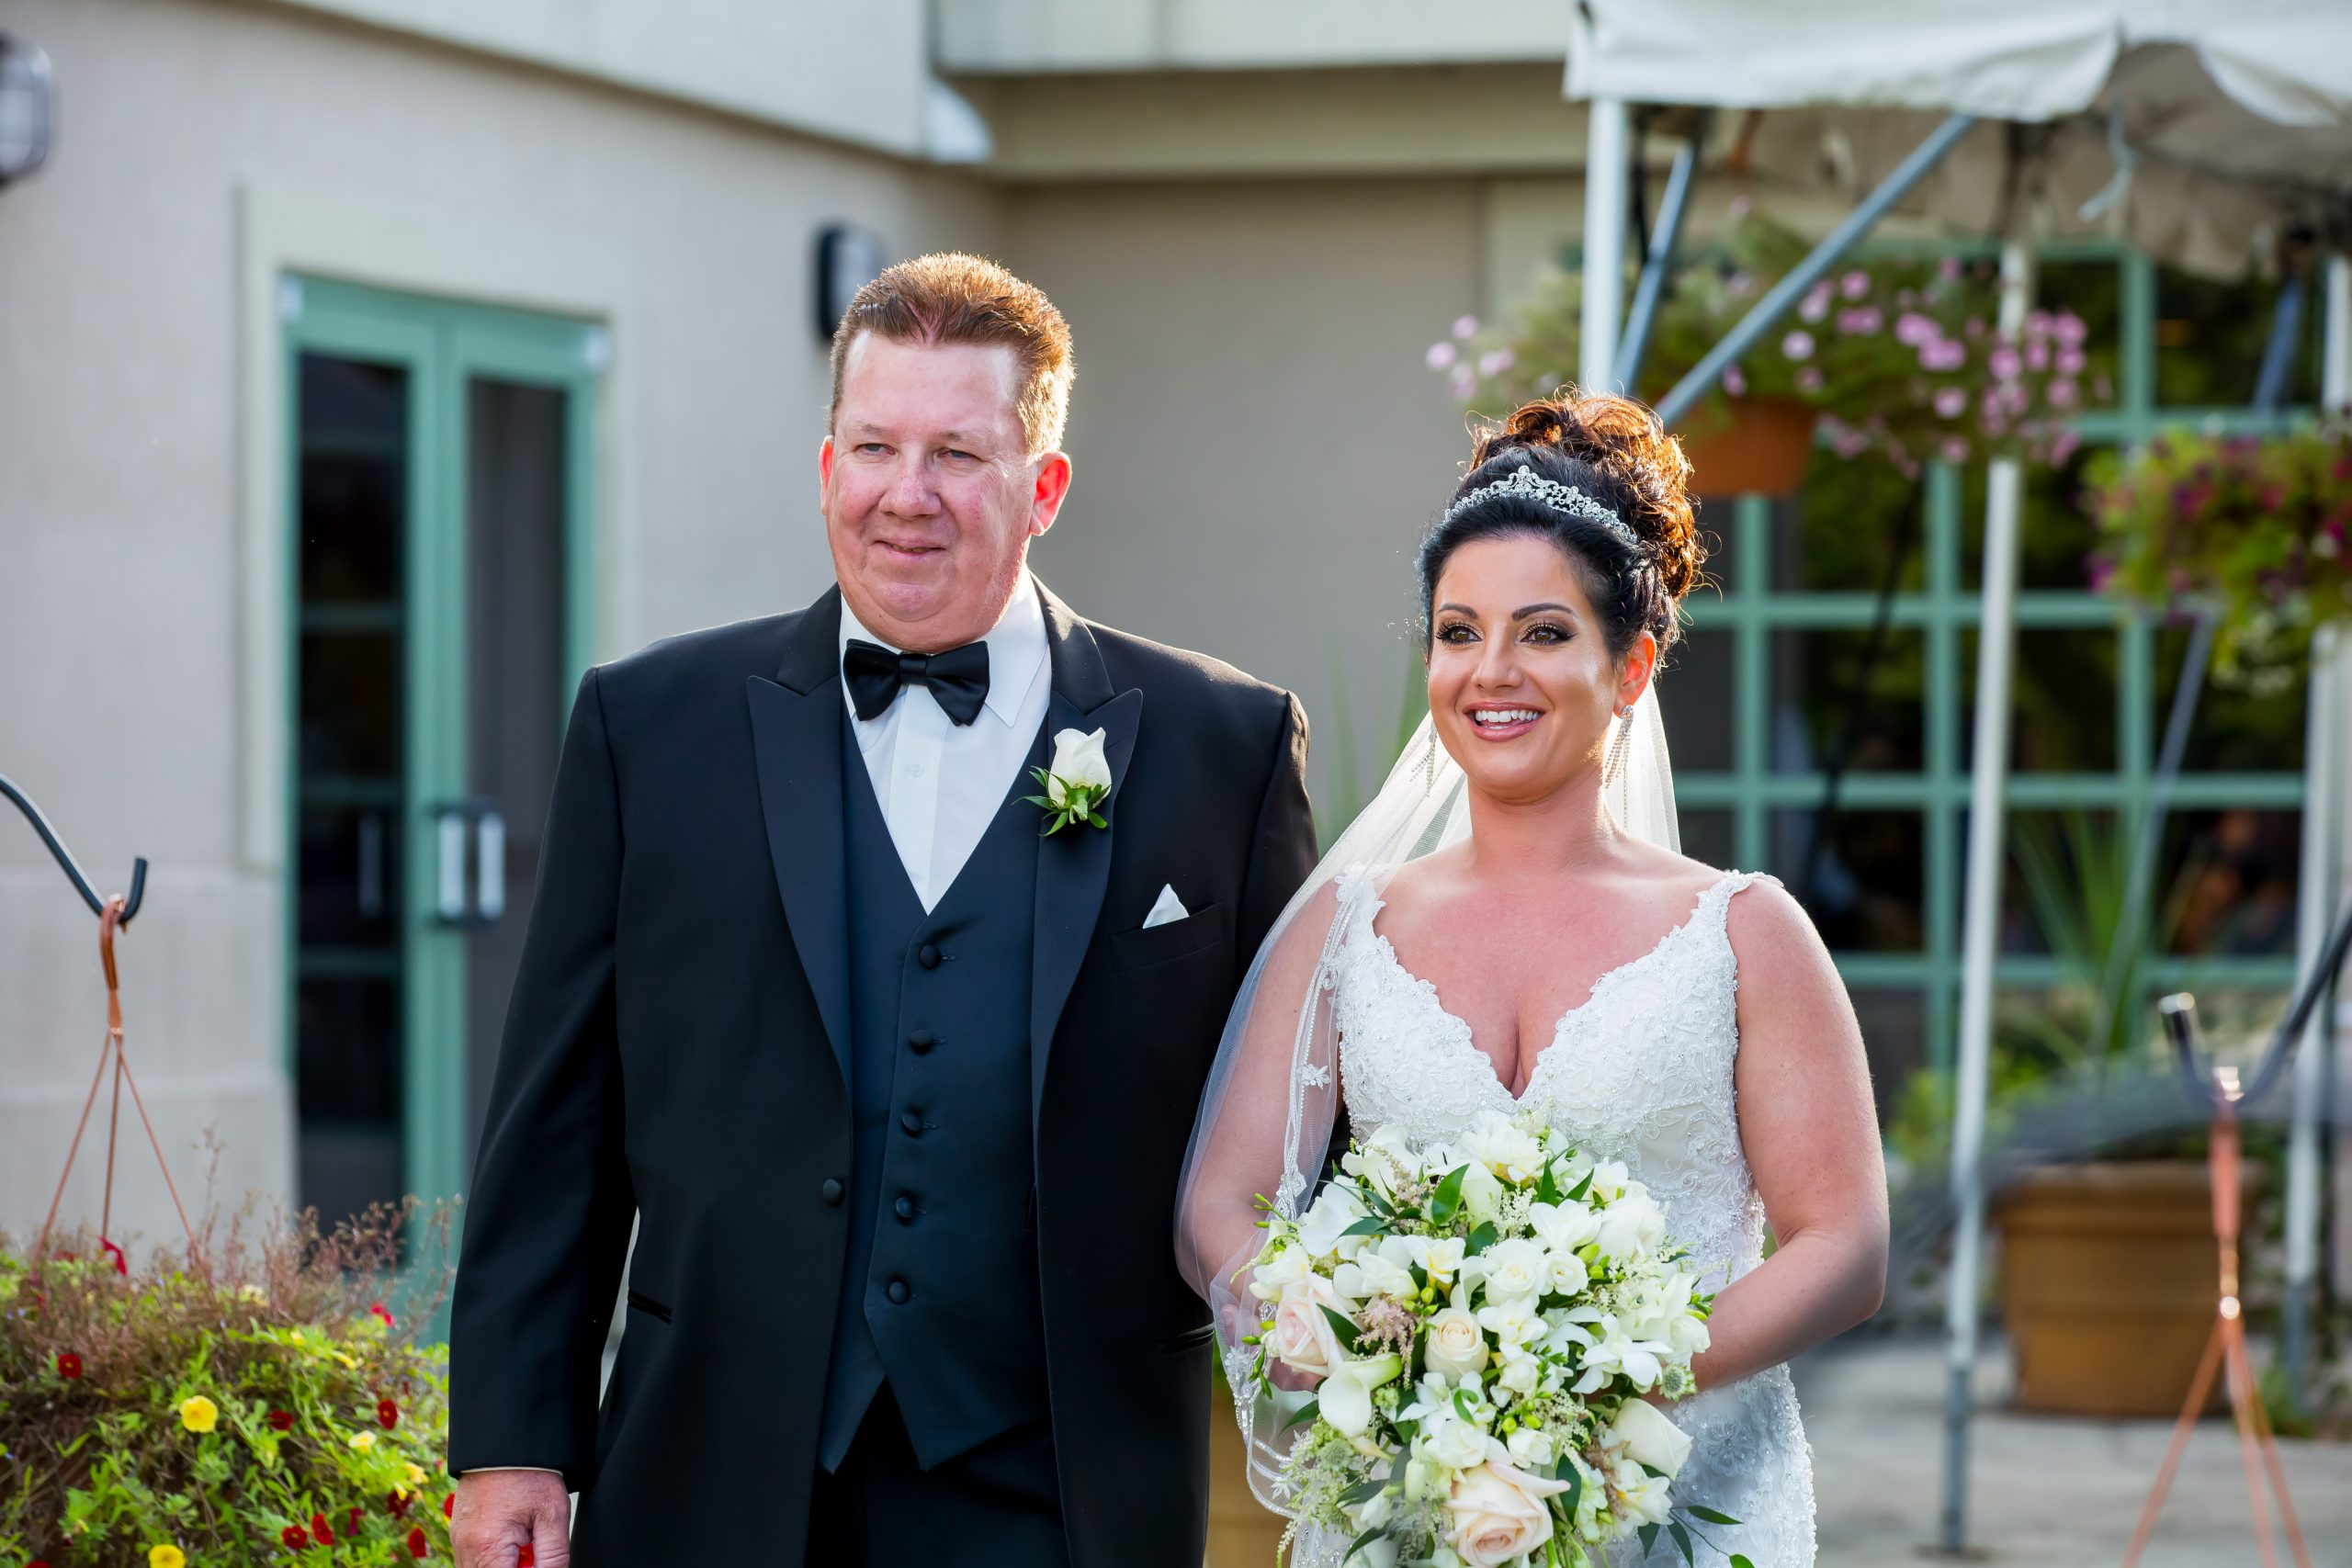 Victori_Rob_Mohawk River Country Club Wedding-27.jpg